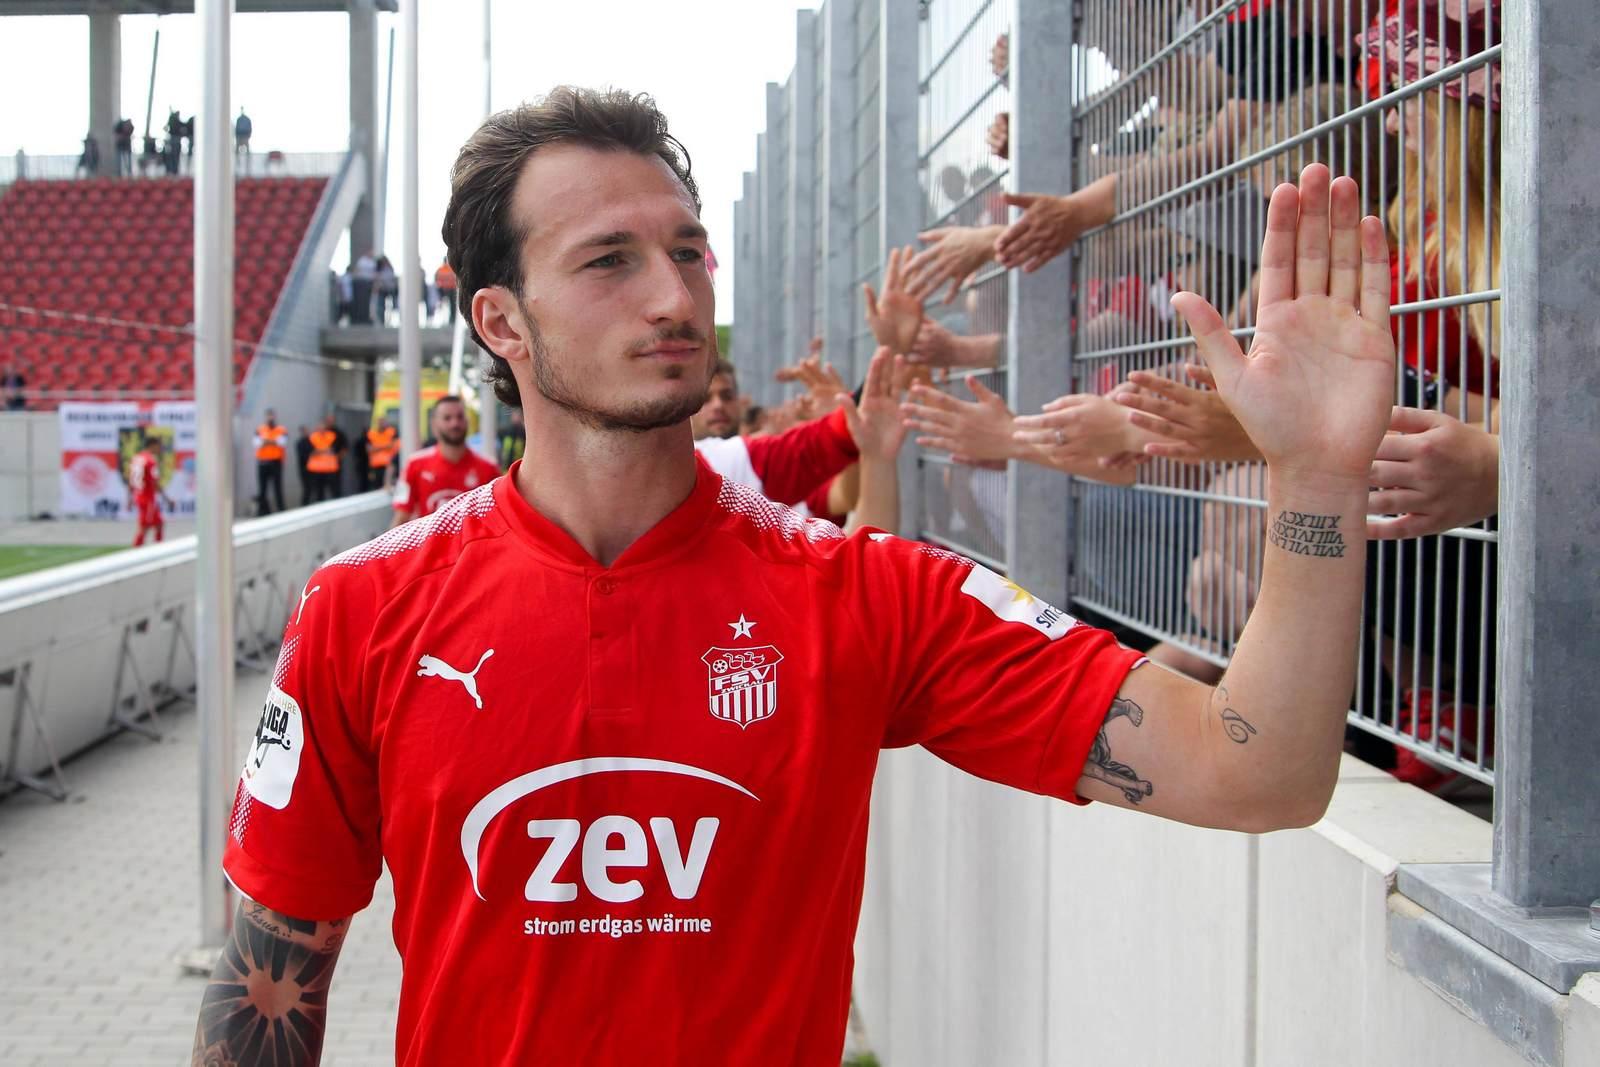 Dimitrios Ferfelis klatscht mit den Fans ab